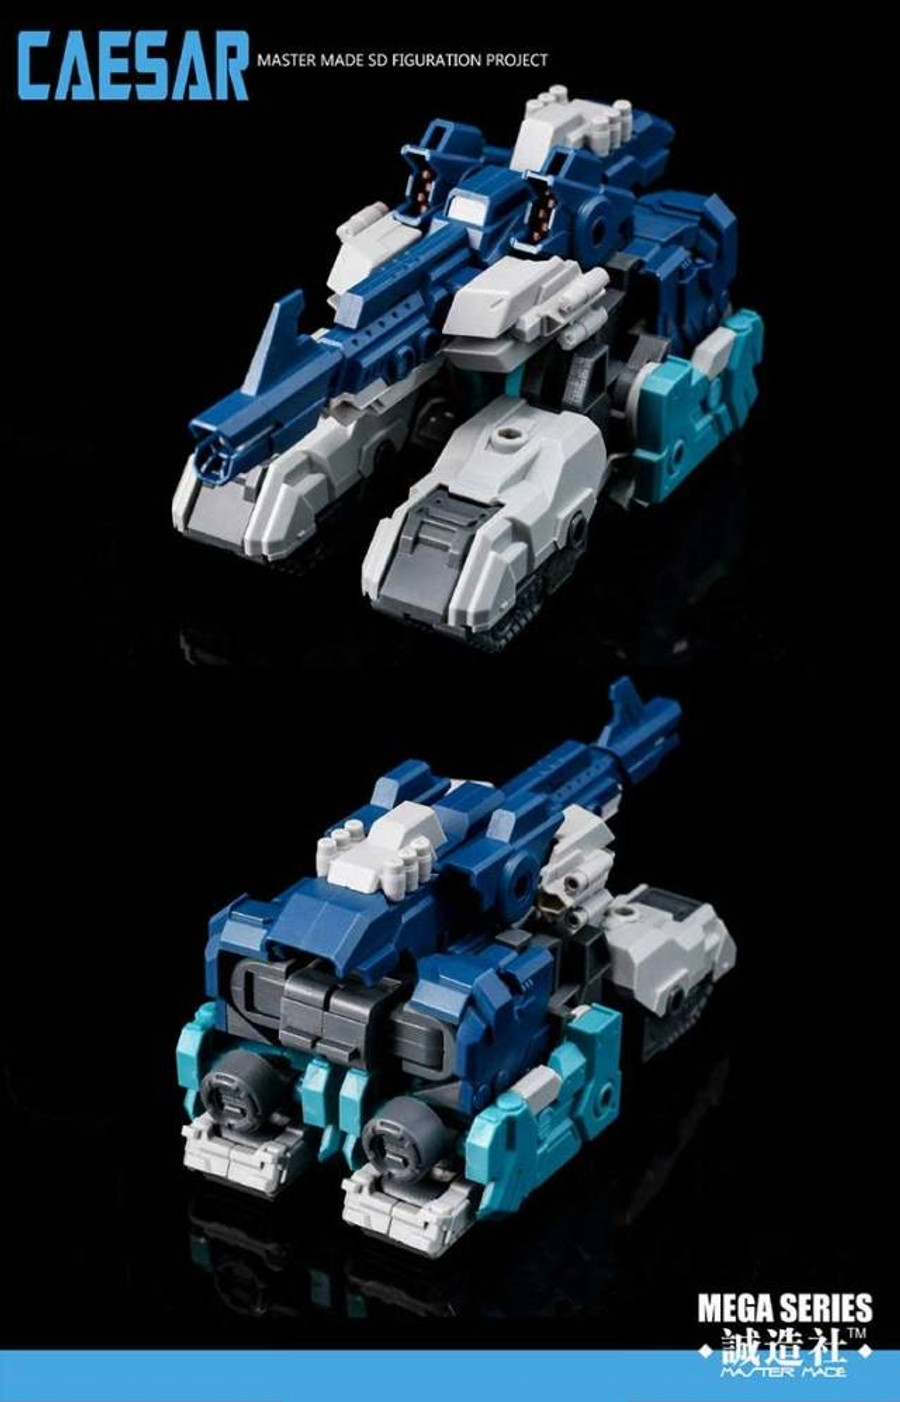 Master Made - SDT-06 Ceasar